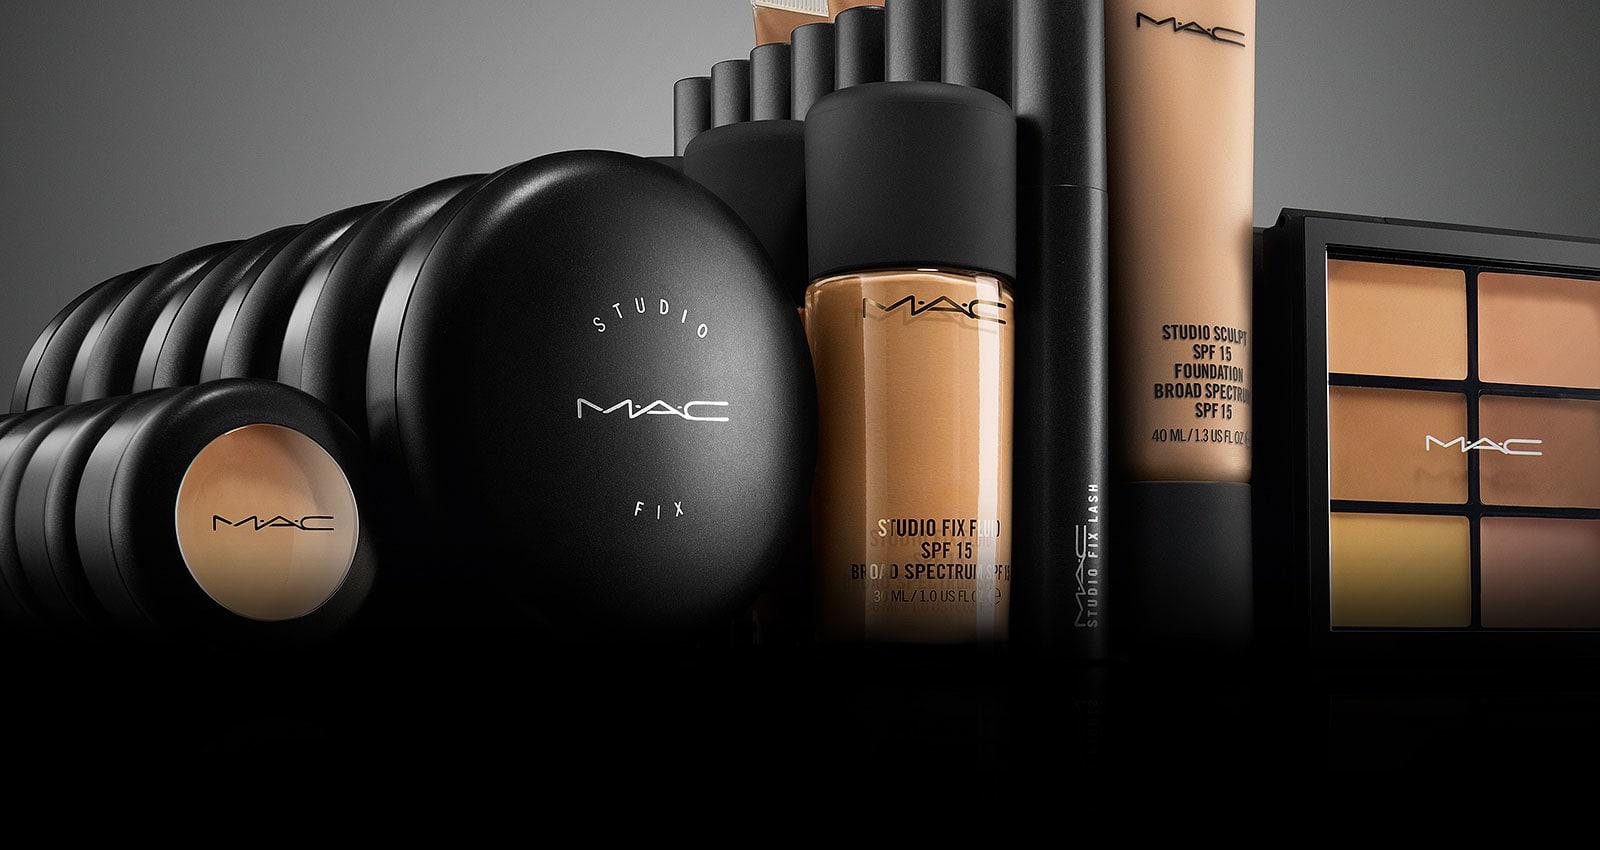 MAC Cosmetics im Angebot bei Vente Privee - z.B. Lippenstifte 11,50€ zzgl. VSK statt 23,40€